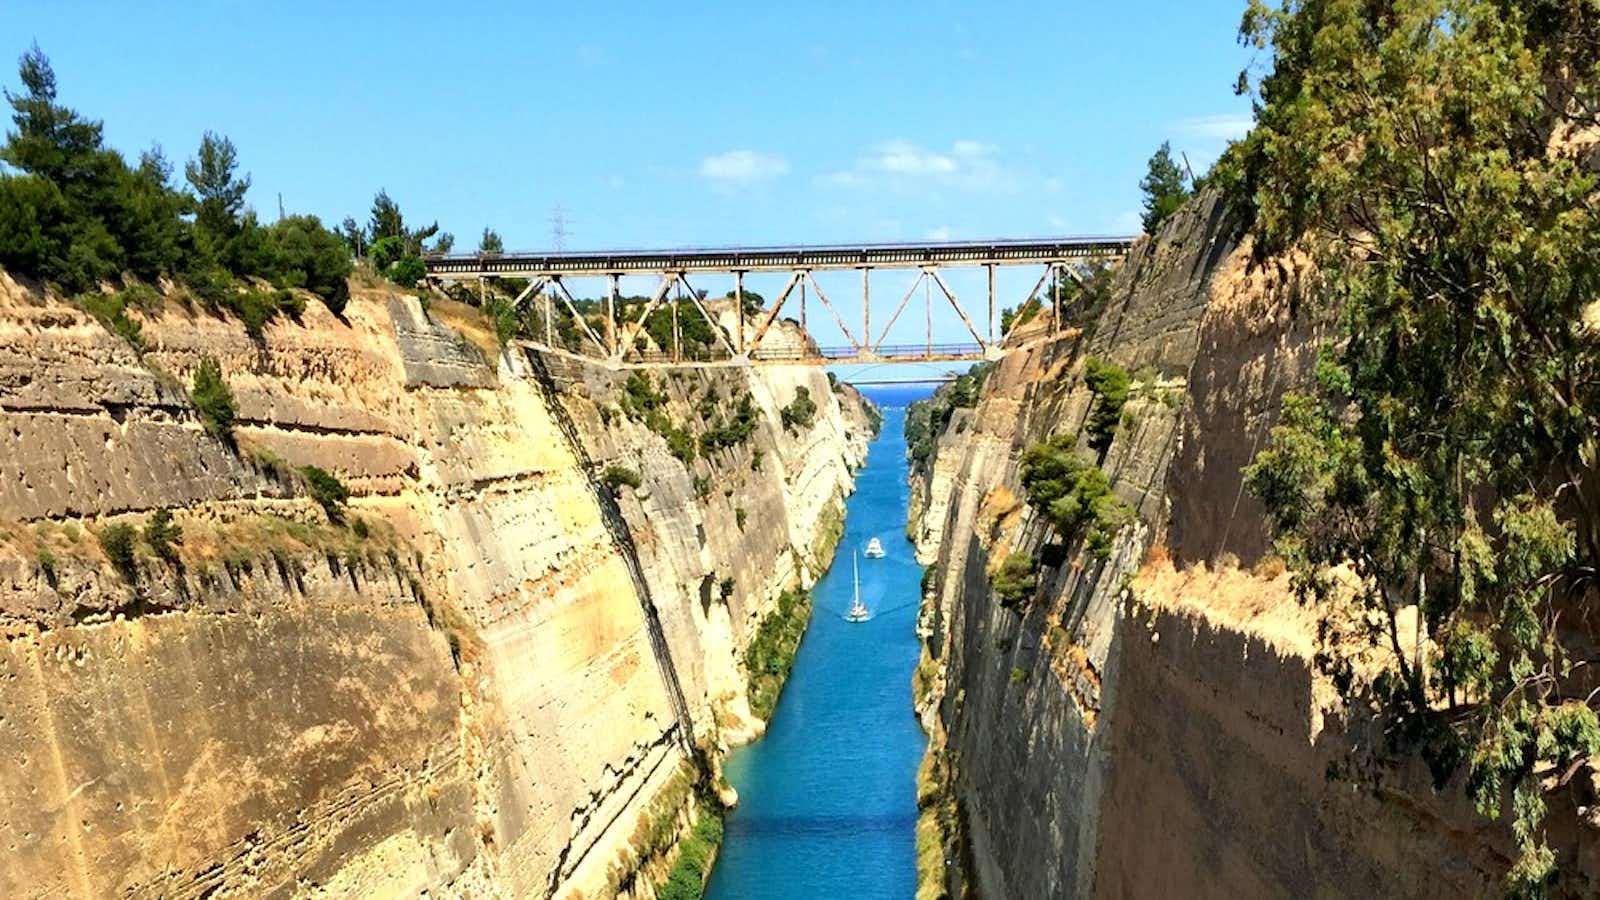 Bungee jump bridge over Corinth Canal